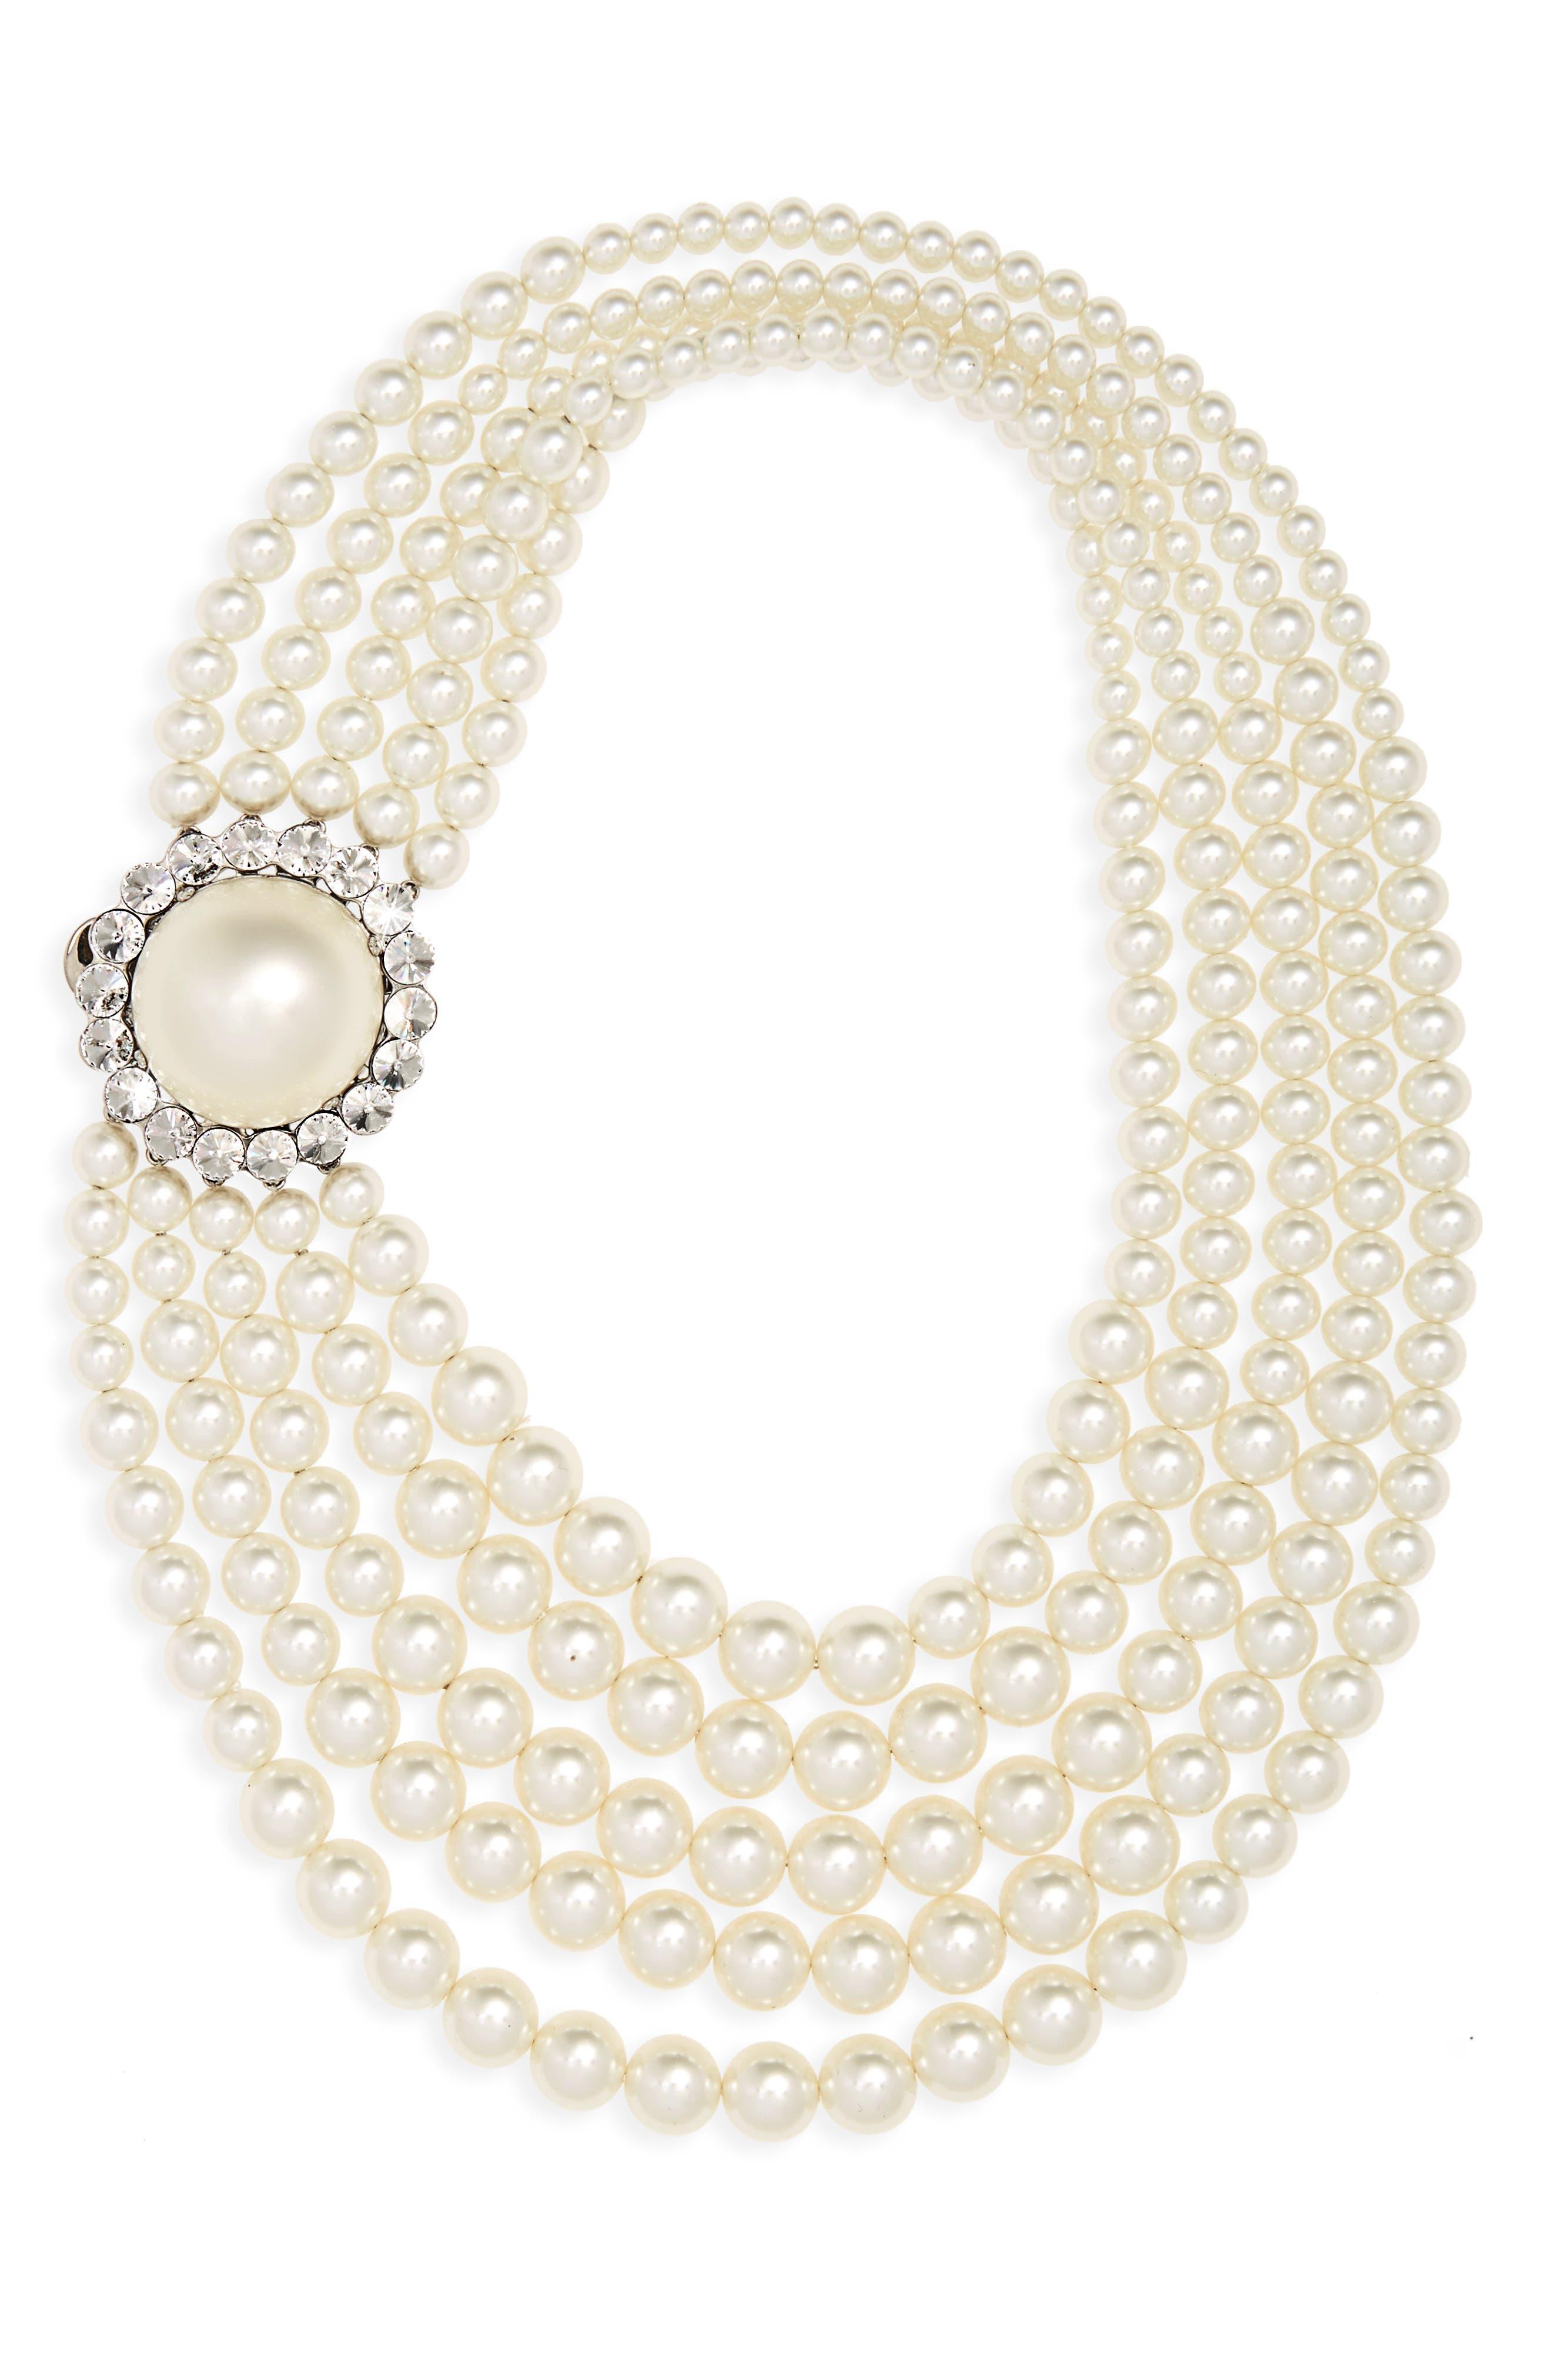 Main Image - Miu Miu Multistrand Imitation Pearl Necklace